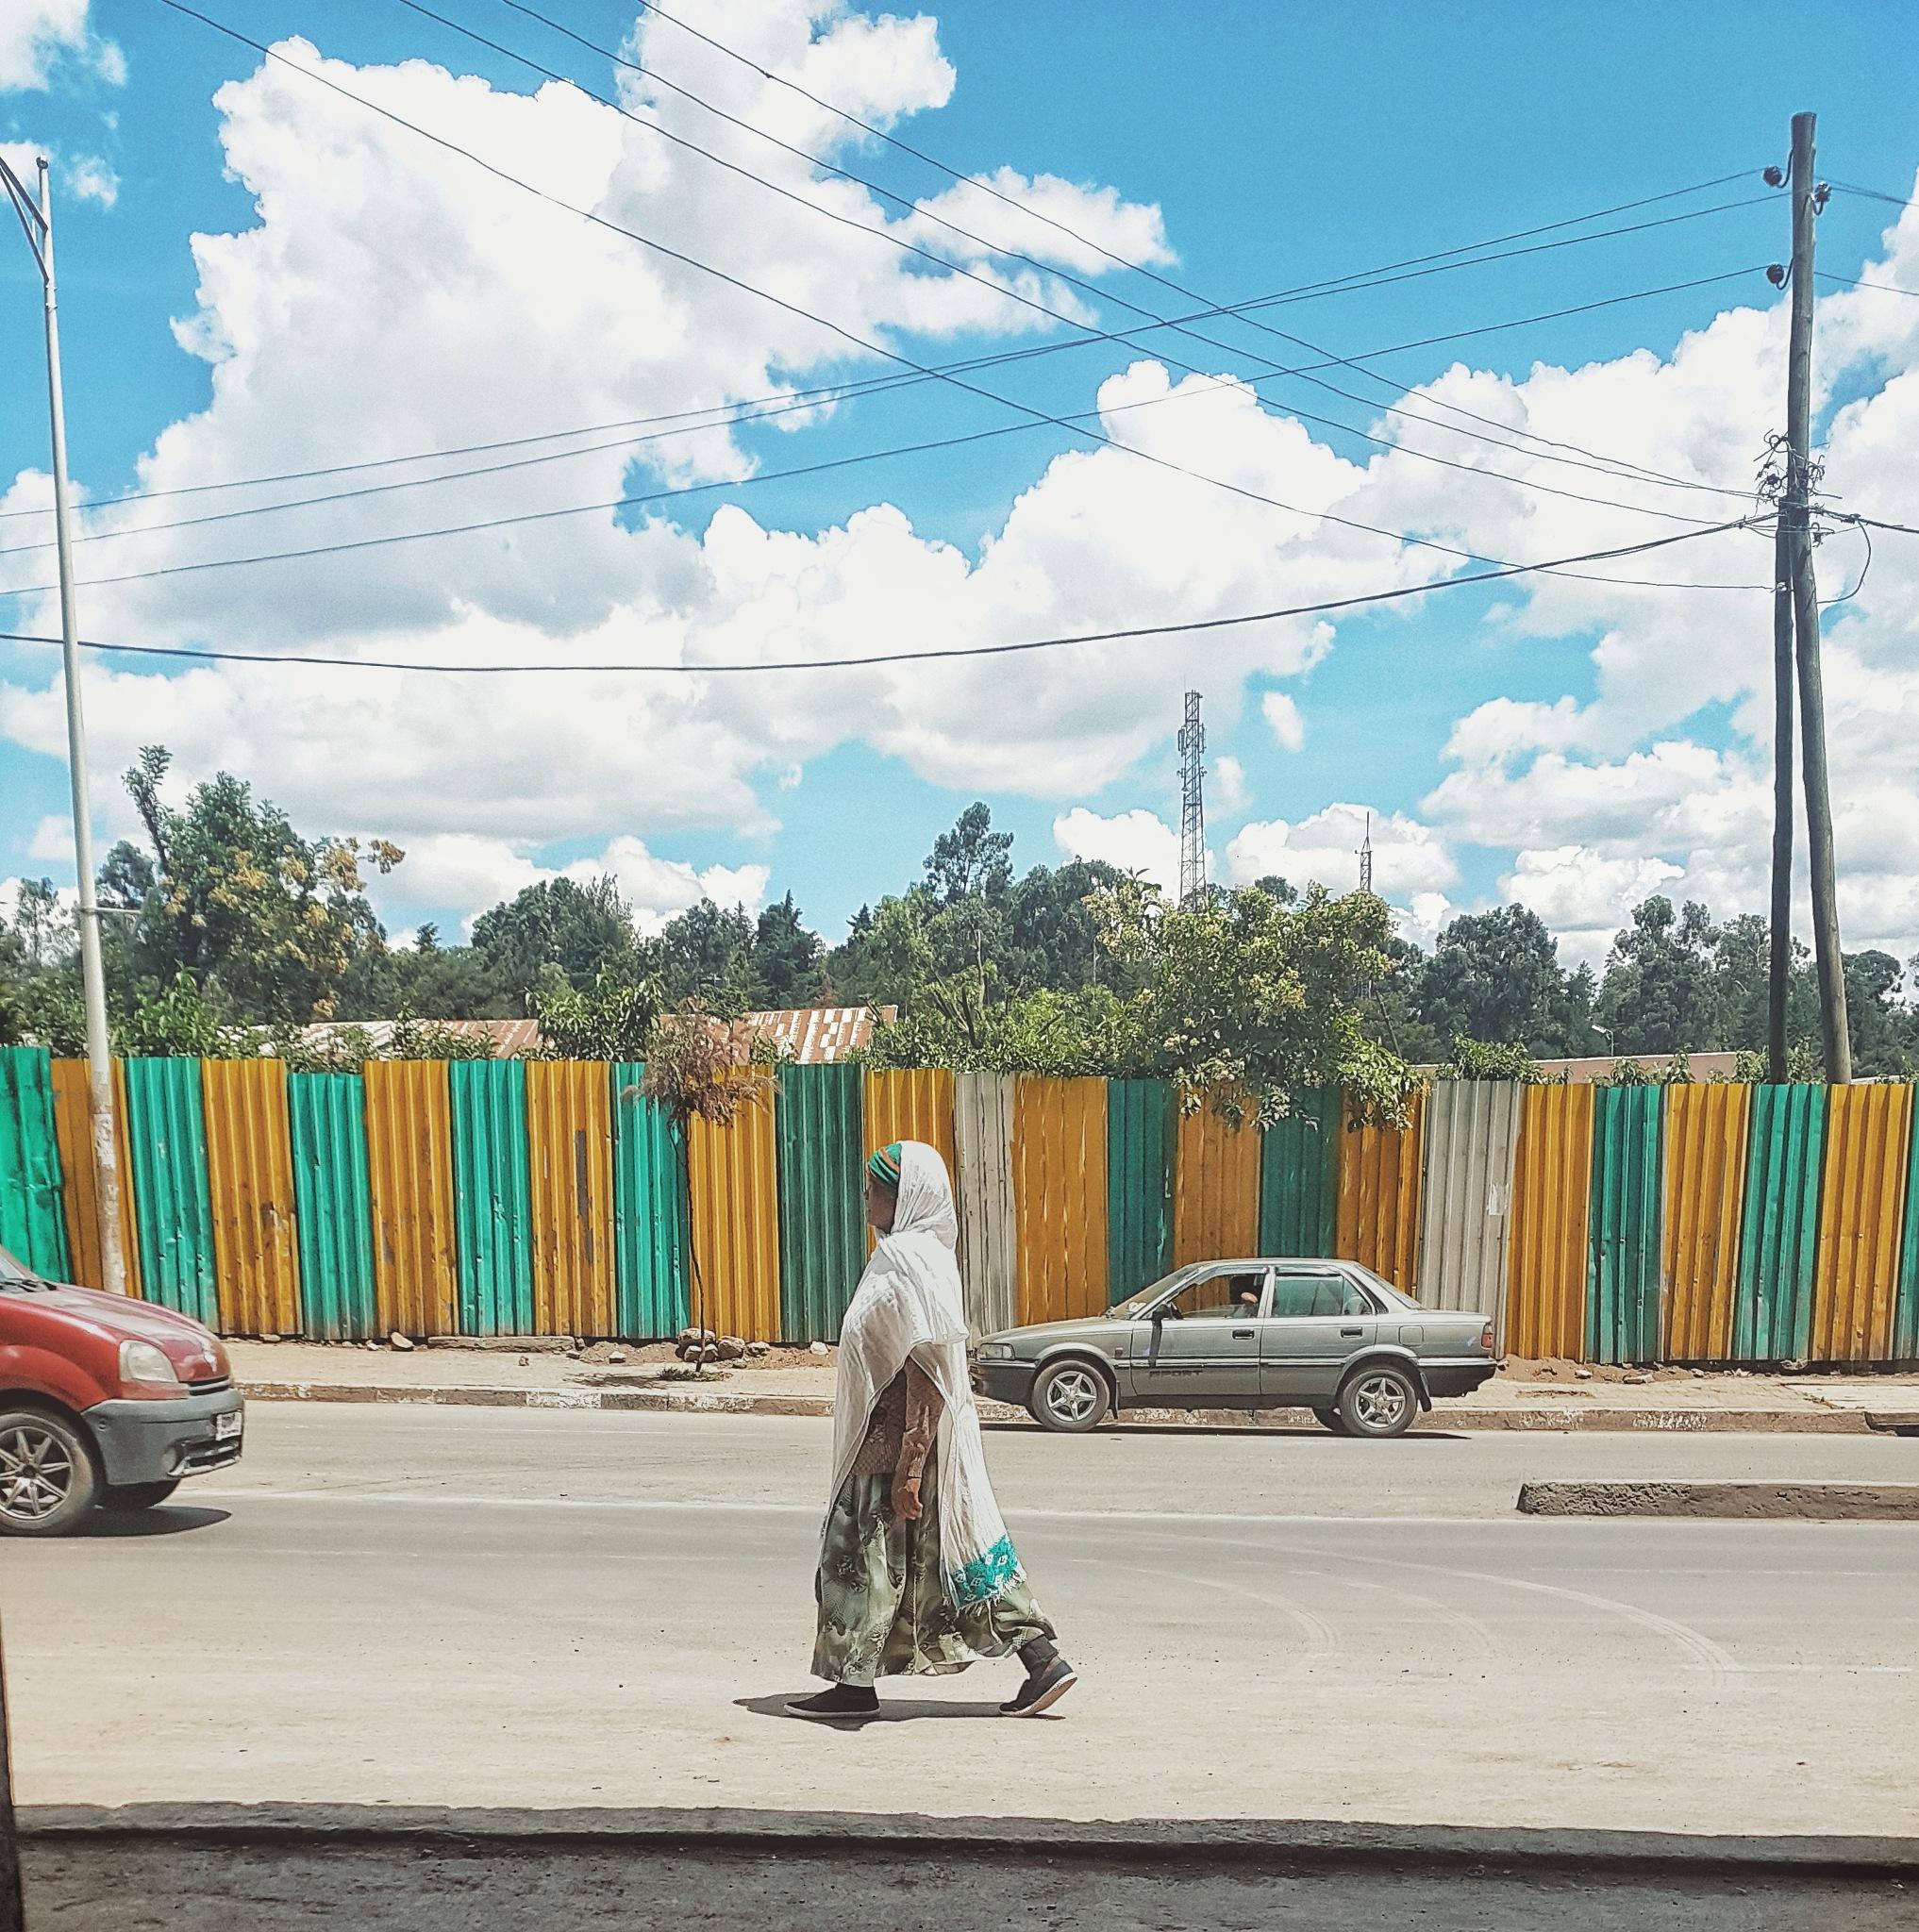 Untitled by Abreham Hailu